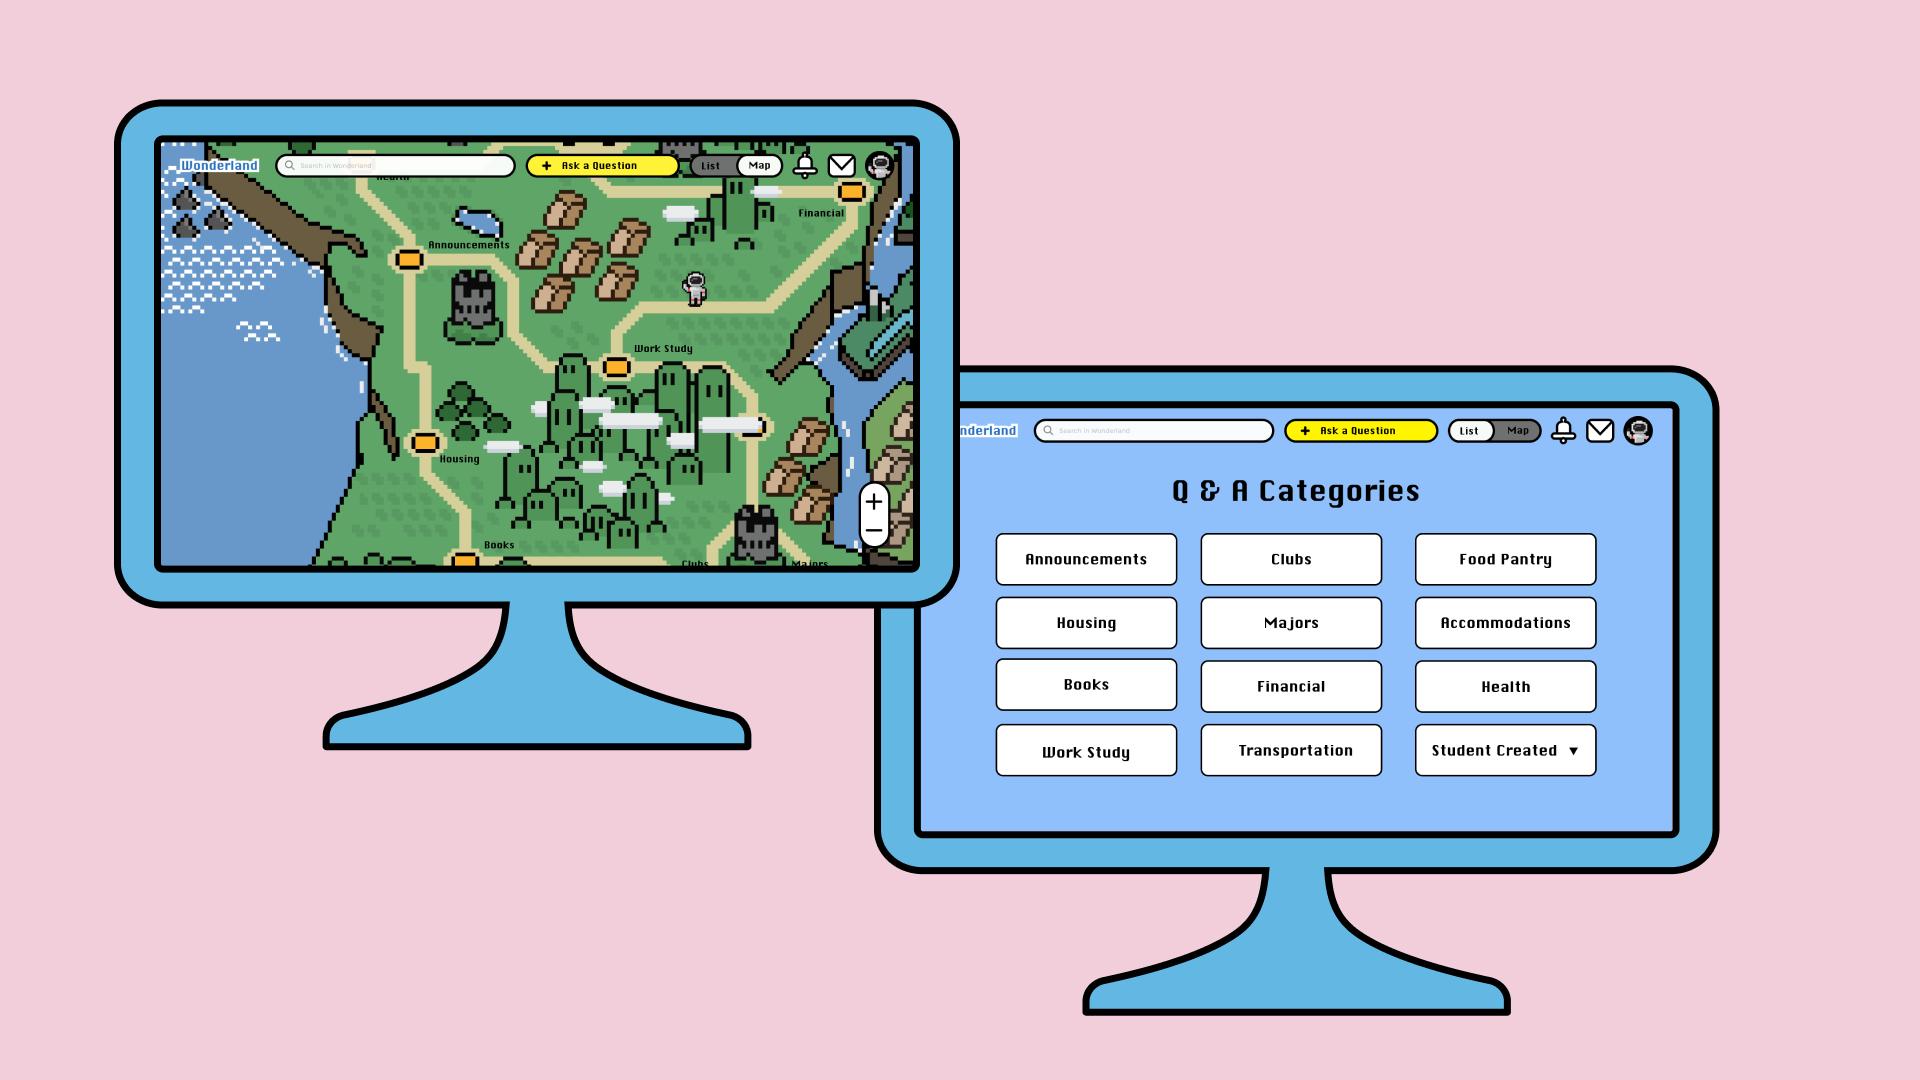 Wonderland homepage Map view vs List view